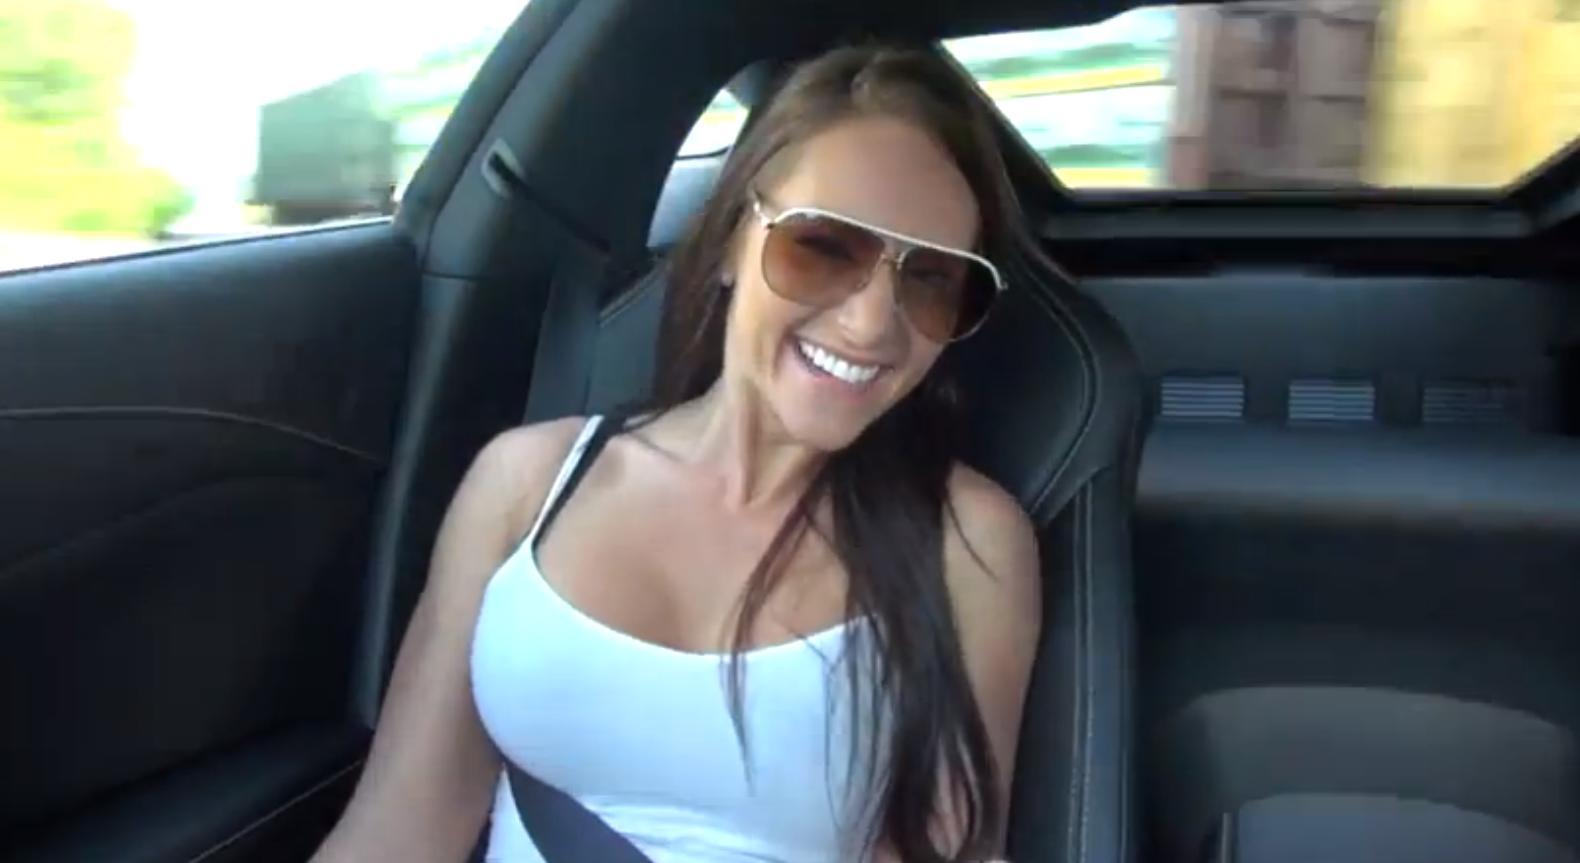 Hot Girl in Passenger Seat